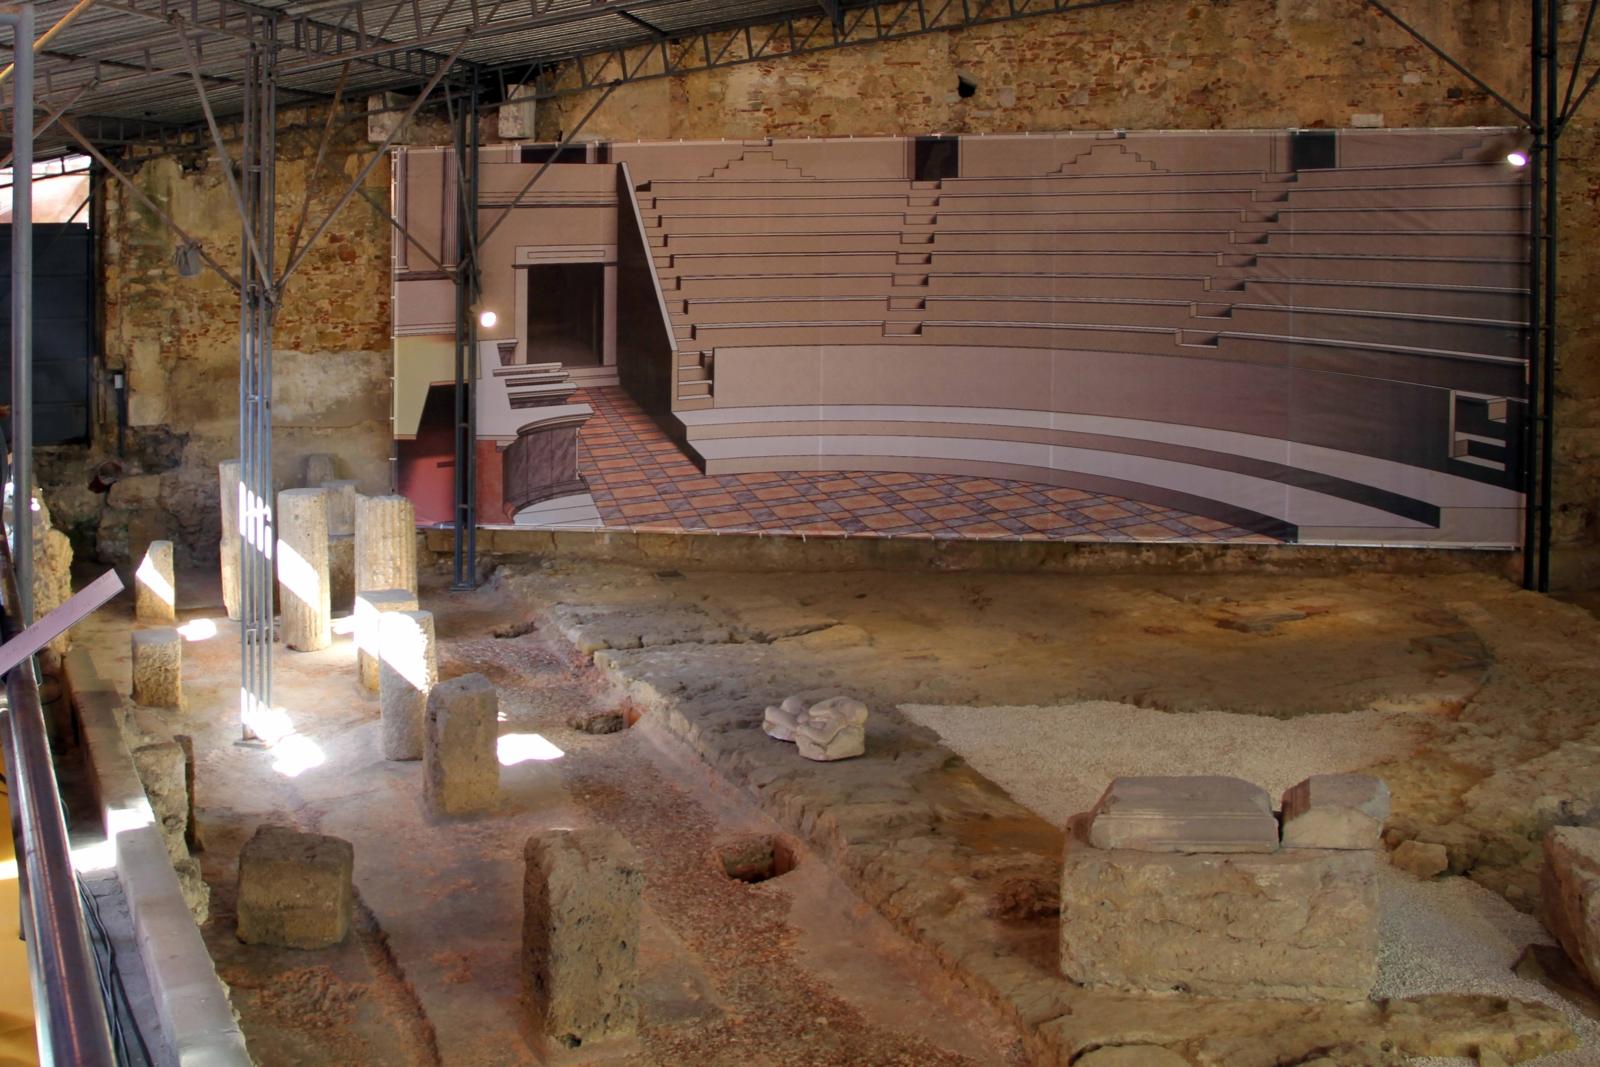 Teatro Romano de Olisipo